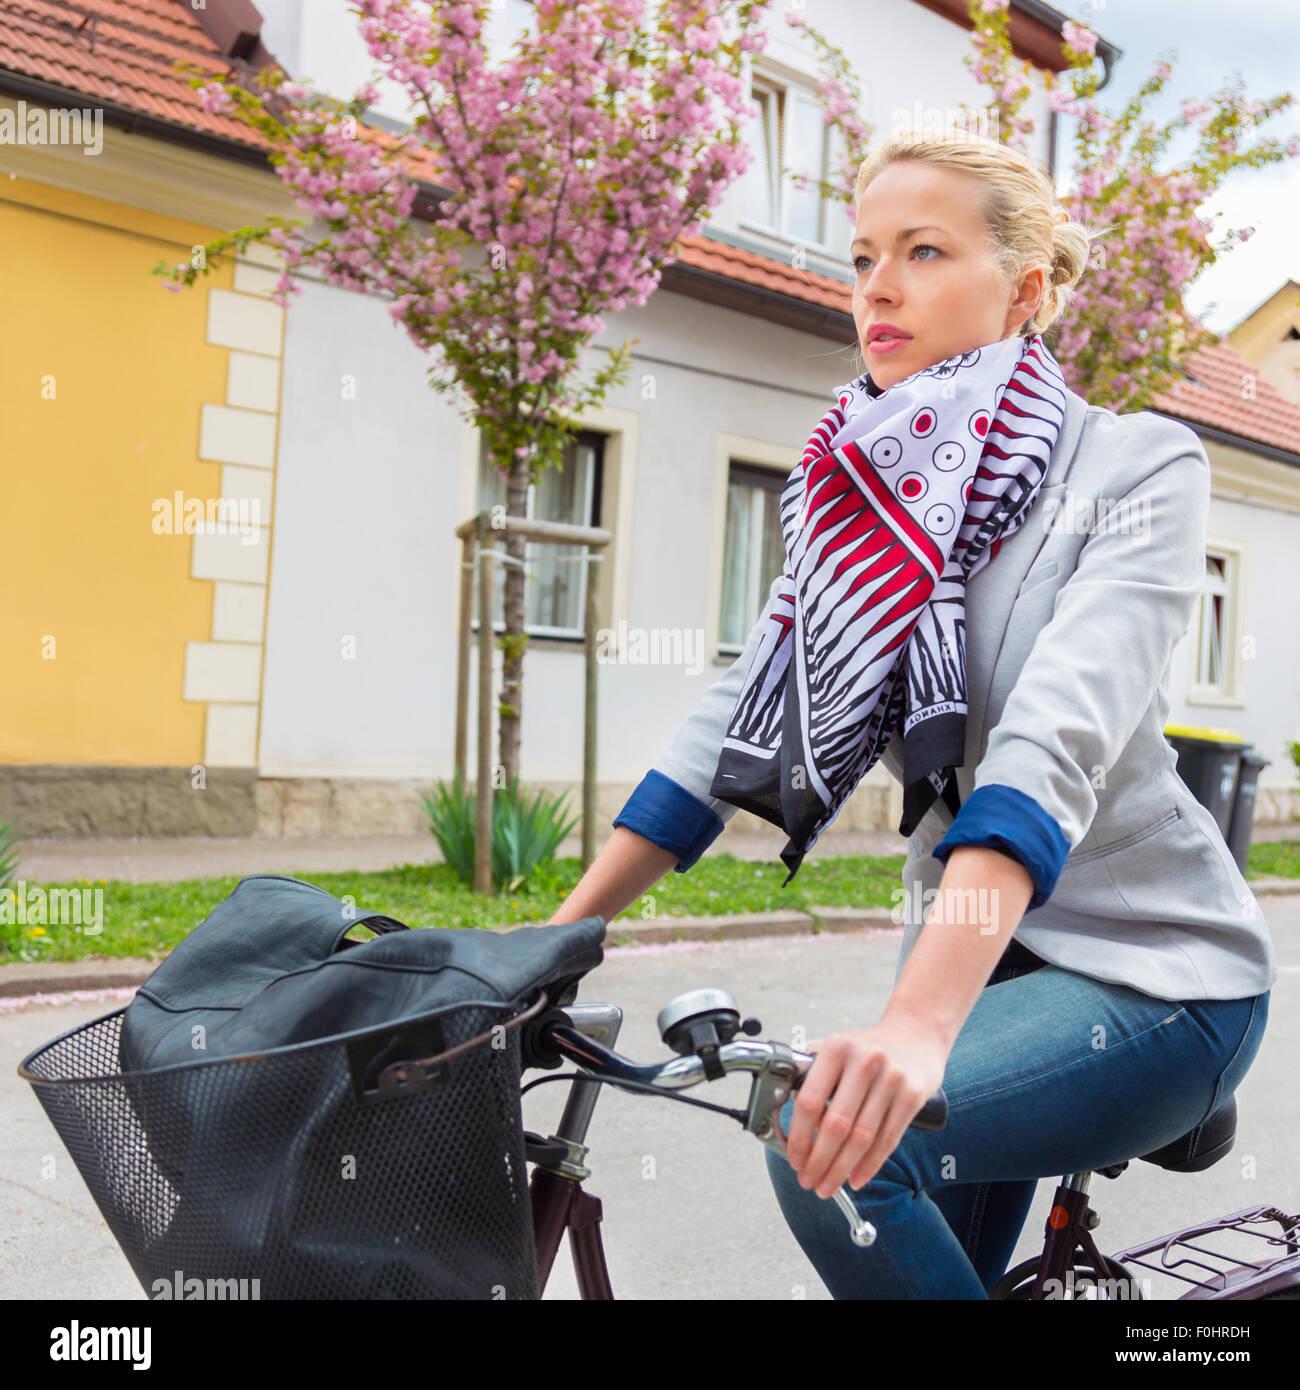 Mujer montando en bicicleta. Imagen De Stock